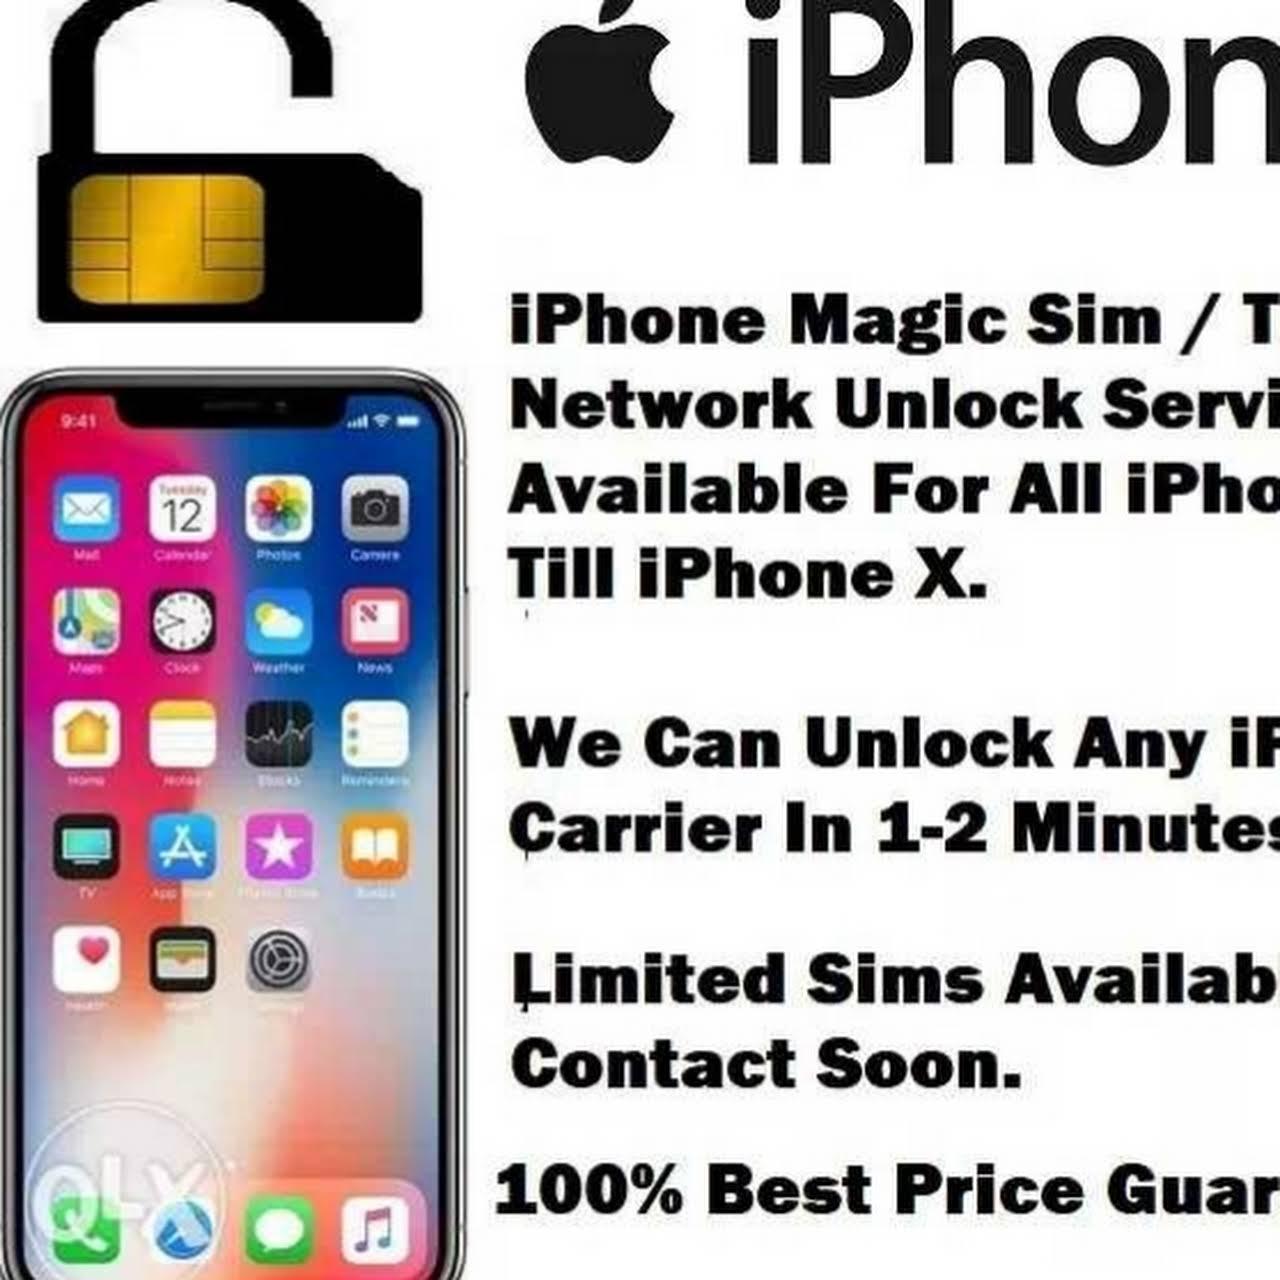 iPhone Network Unlock & Repair & Screen Replacement Services